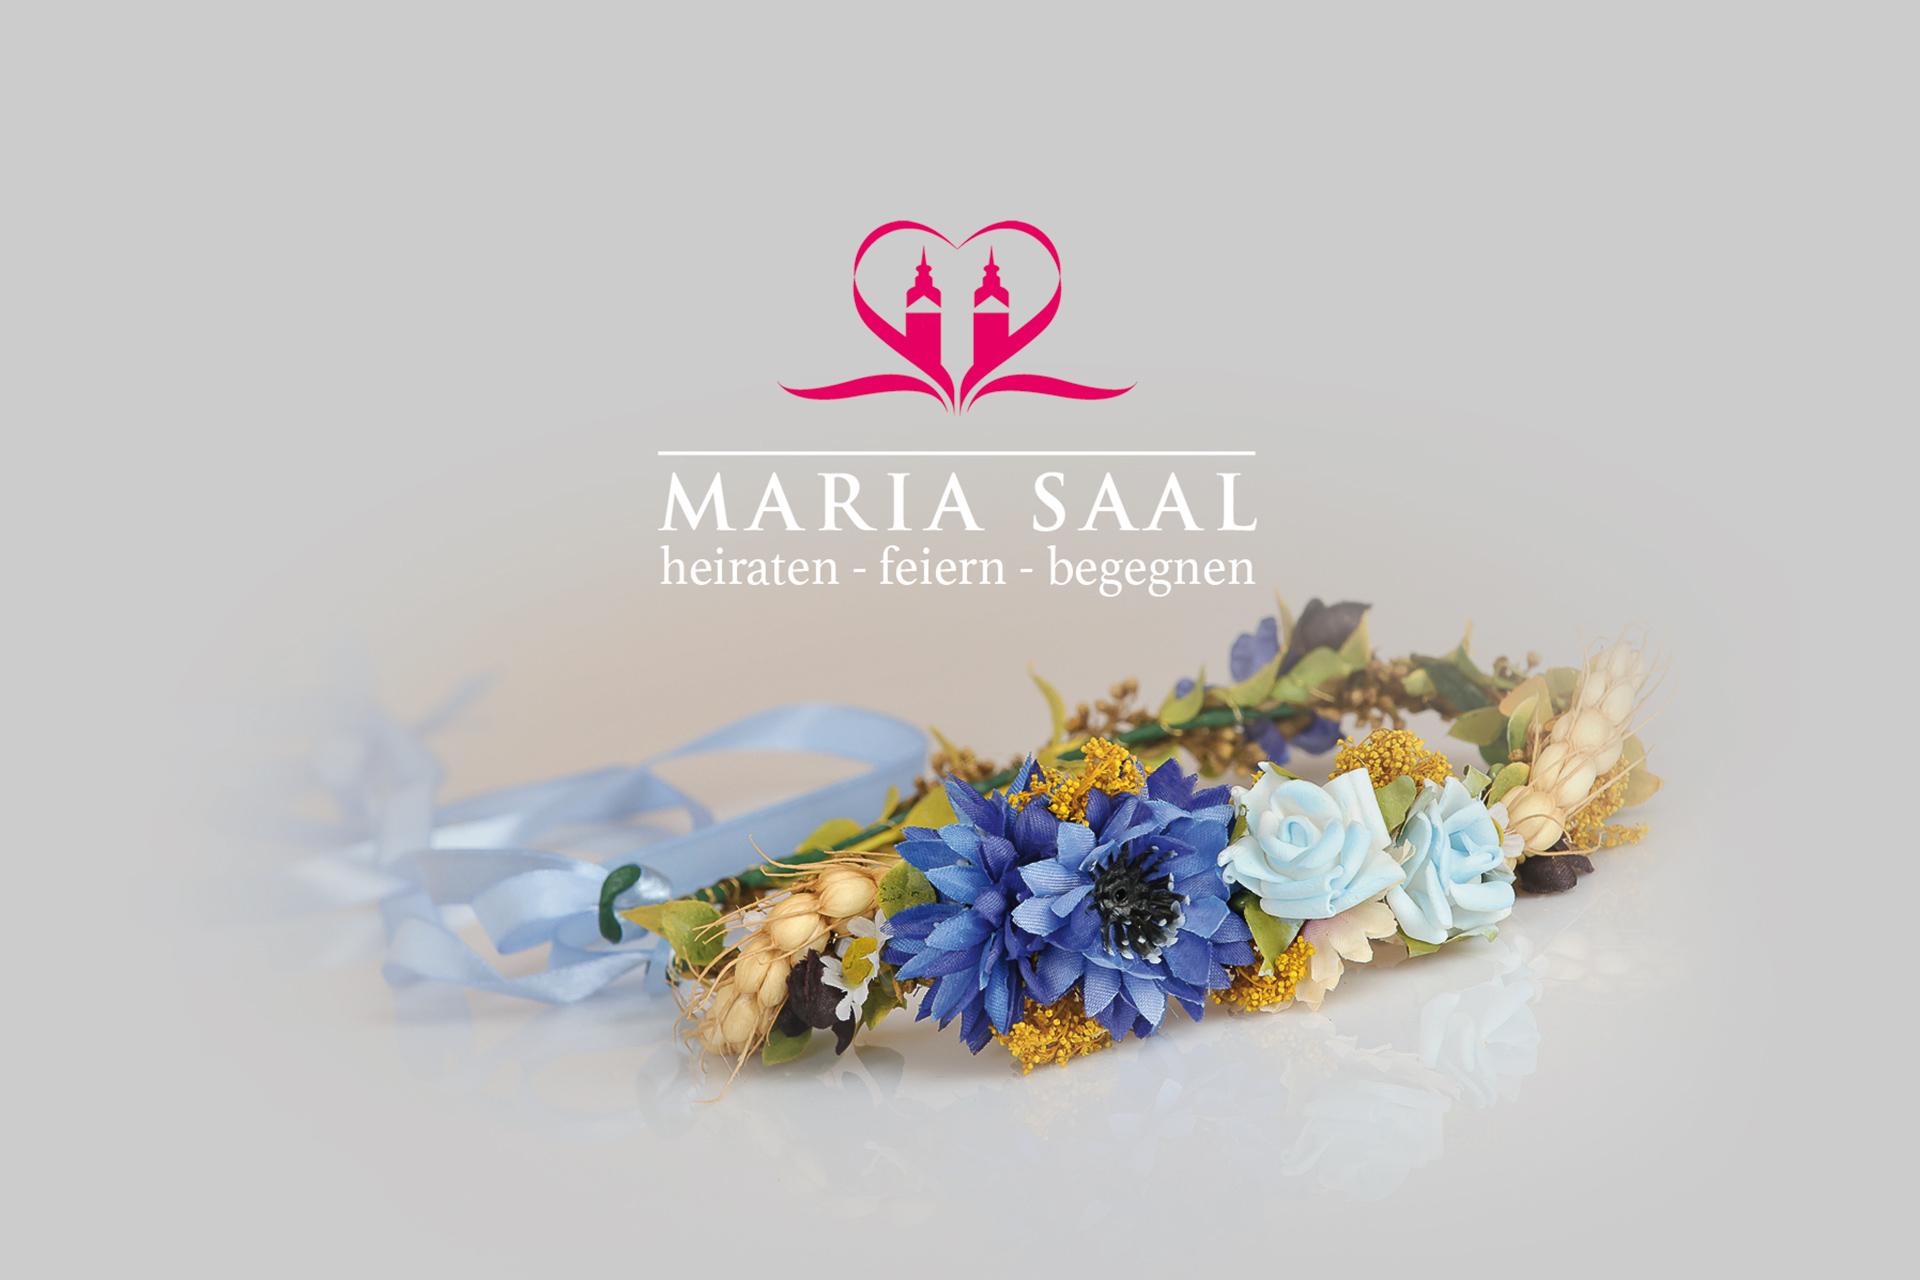 Maria Saal - heiraten - feiern - begegnen